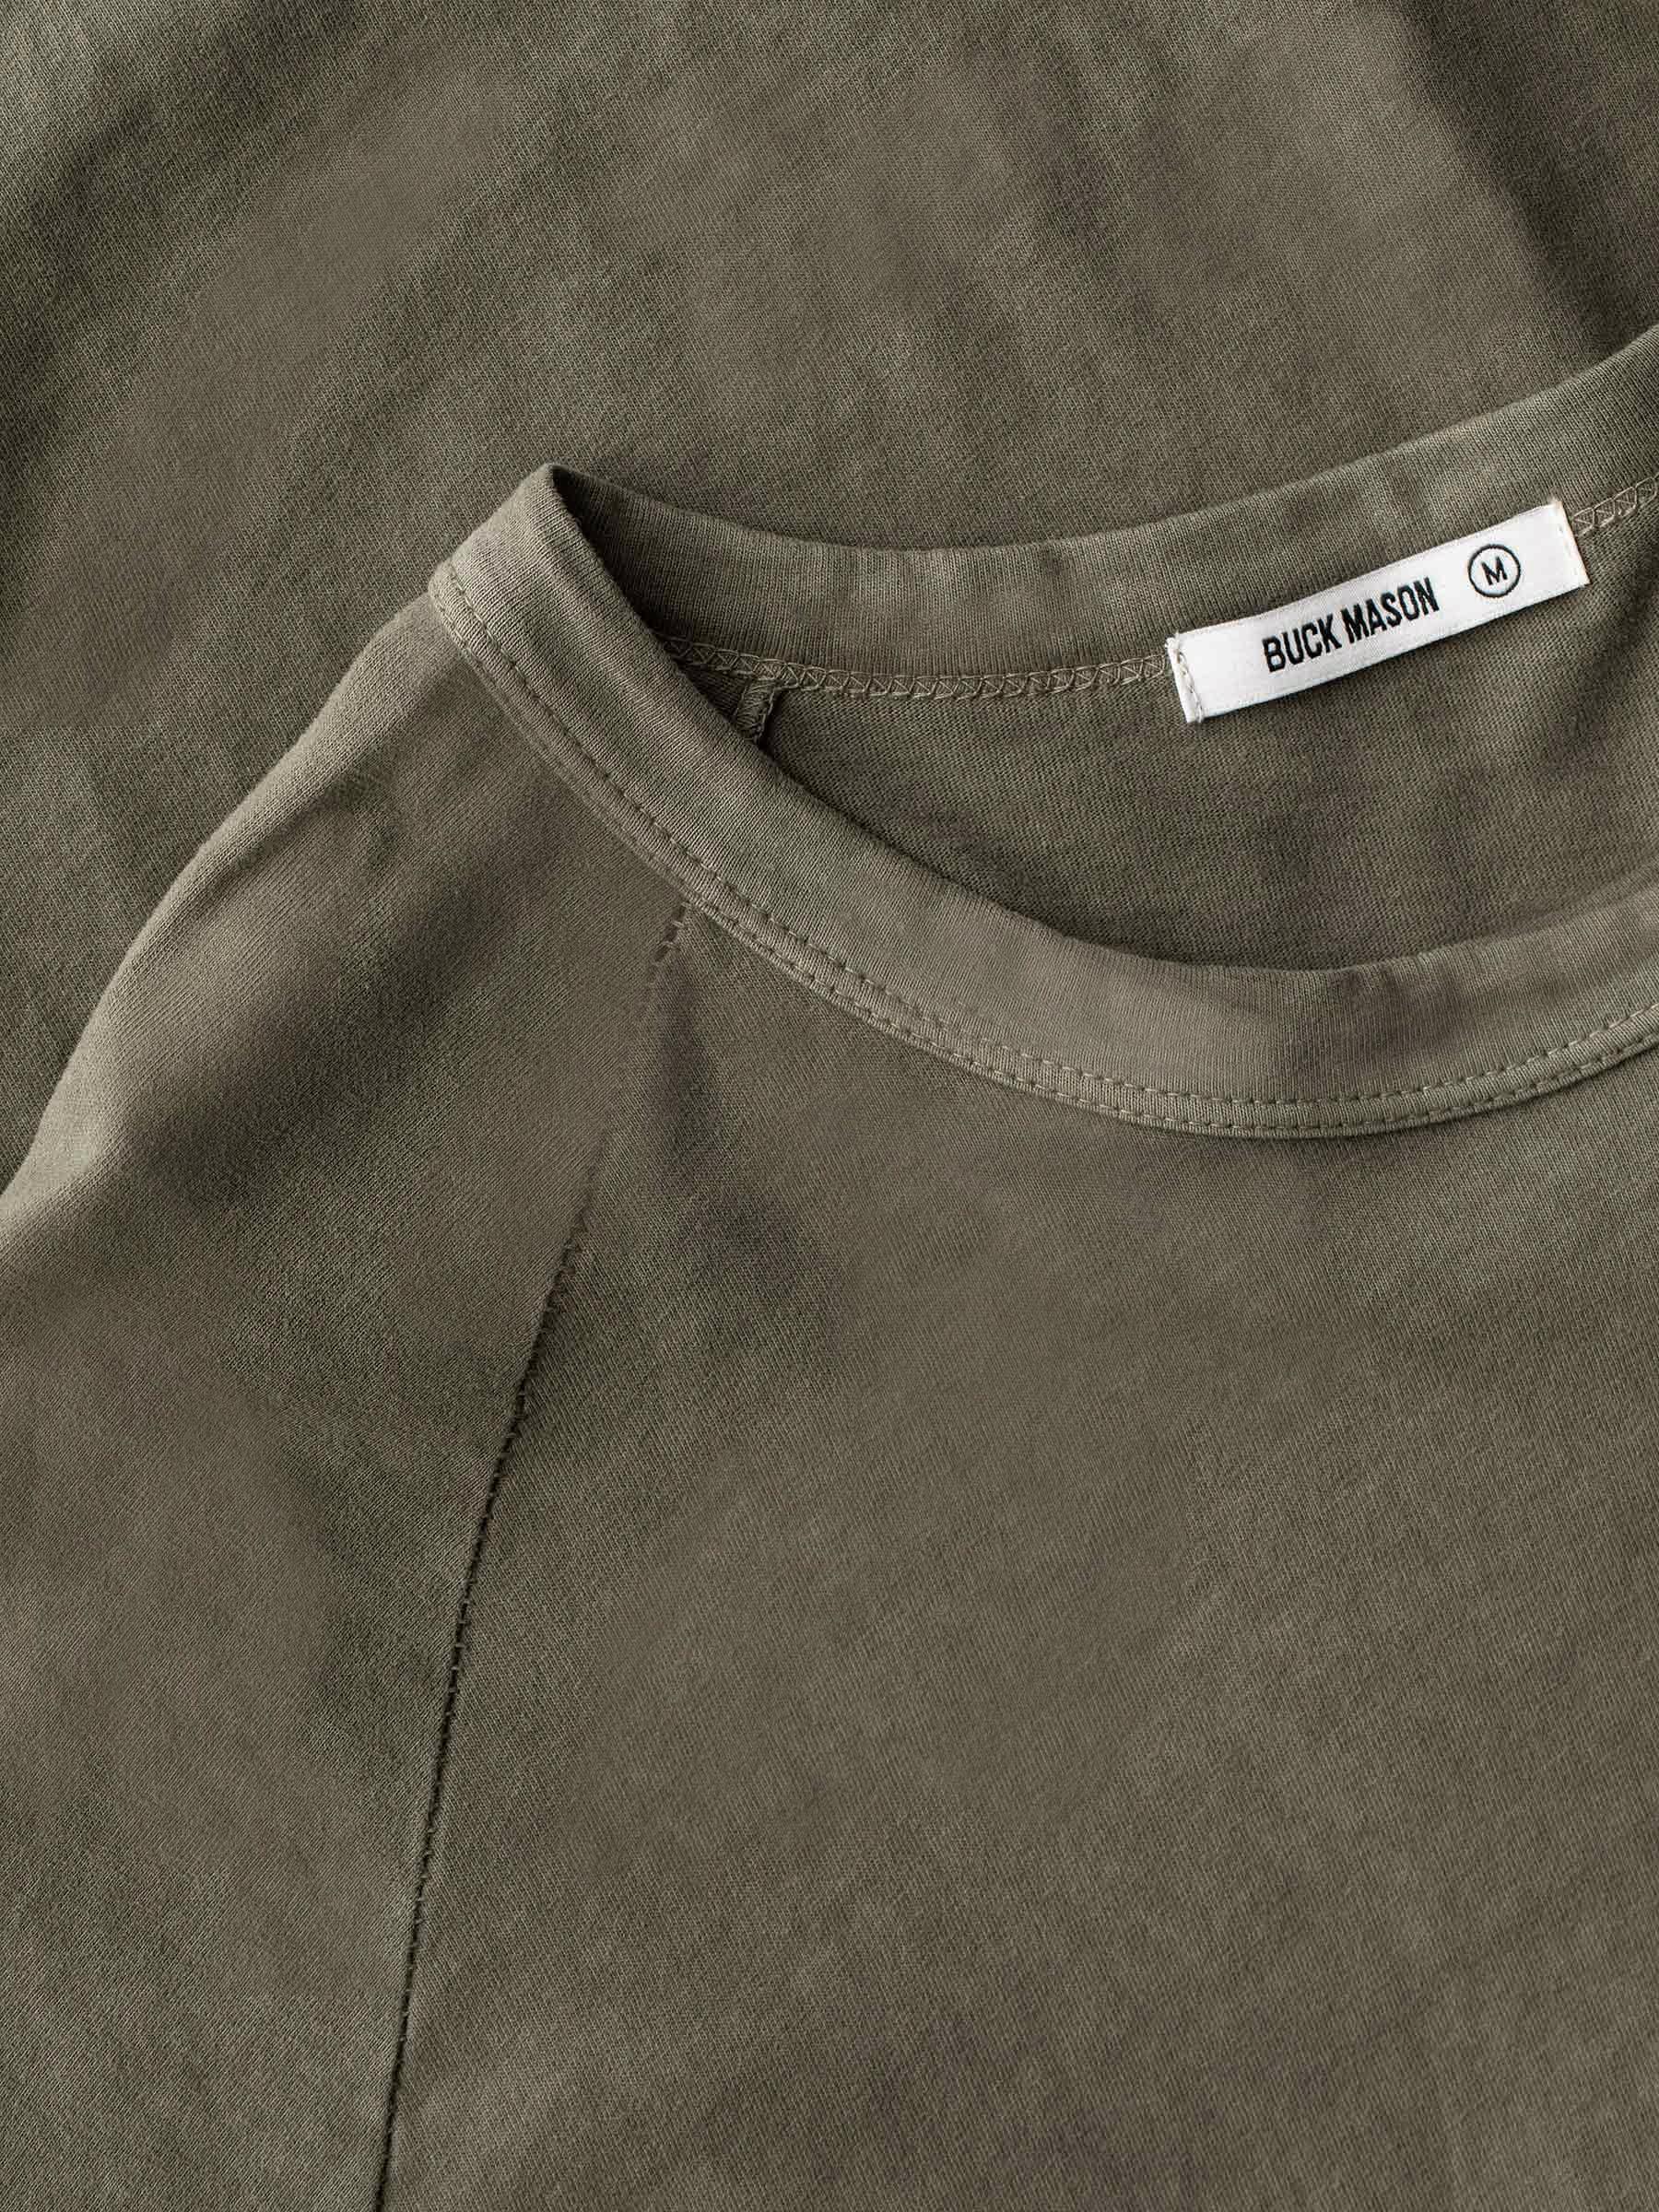 Buck Mason - Copper Venice Wash Sueded Cotton Long Sleeve Raglan Tee